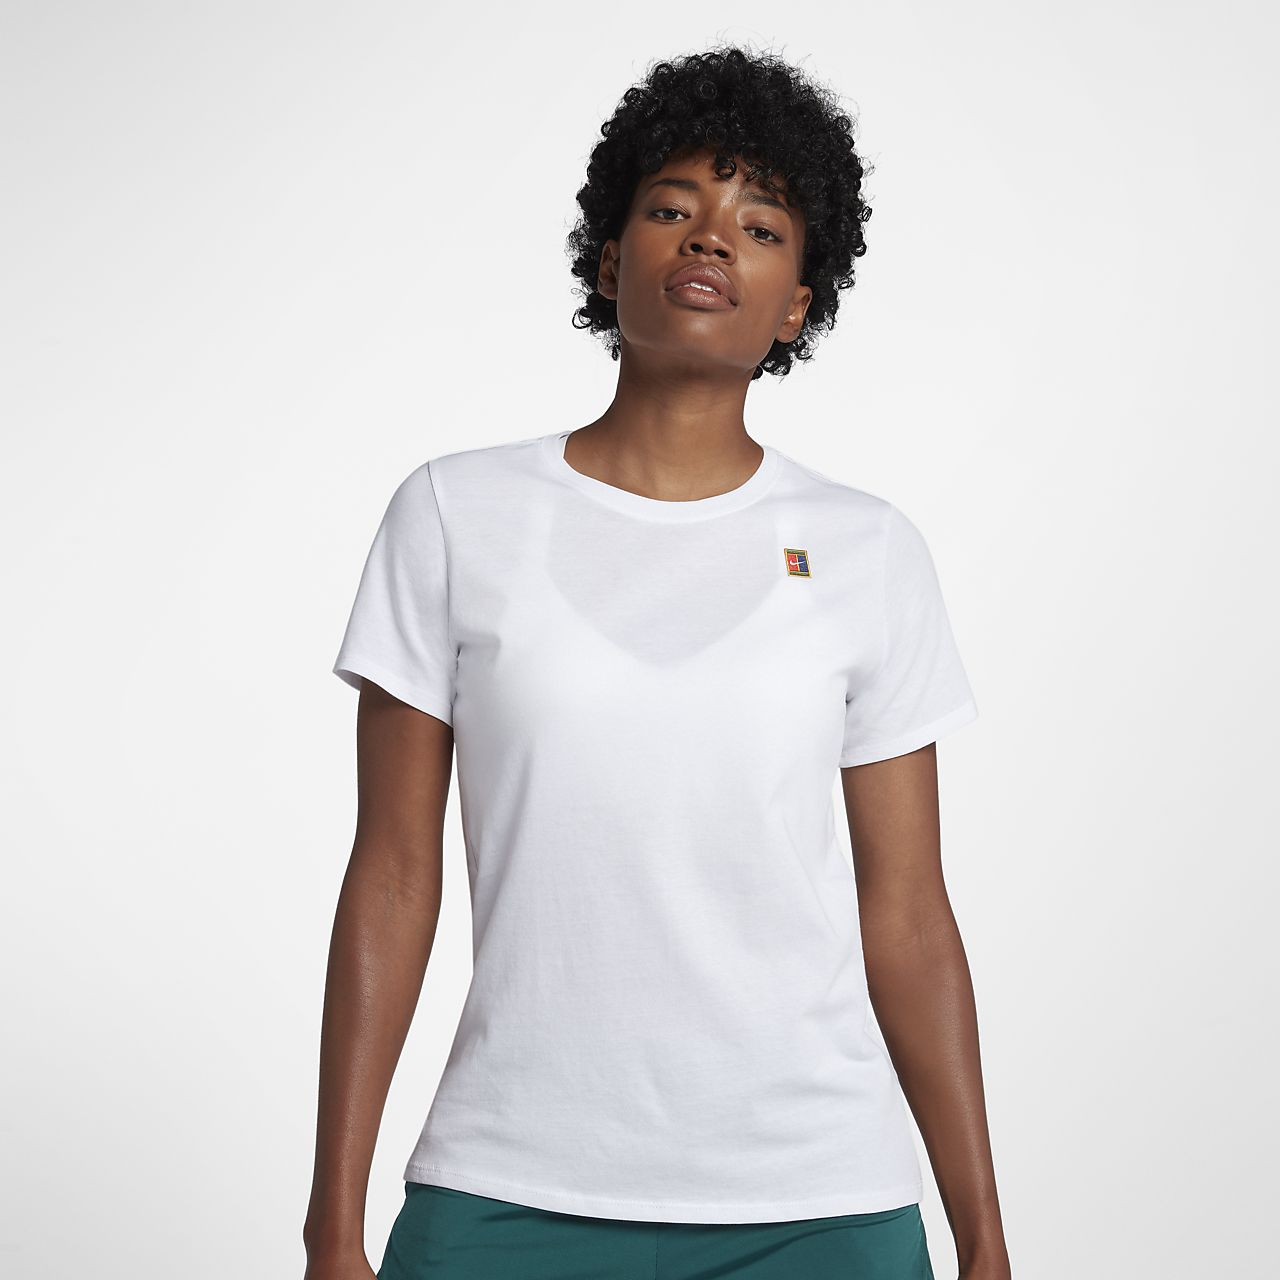 Tee-shirt de tennis NikeCourt pour Femme